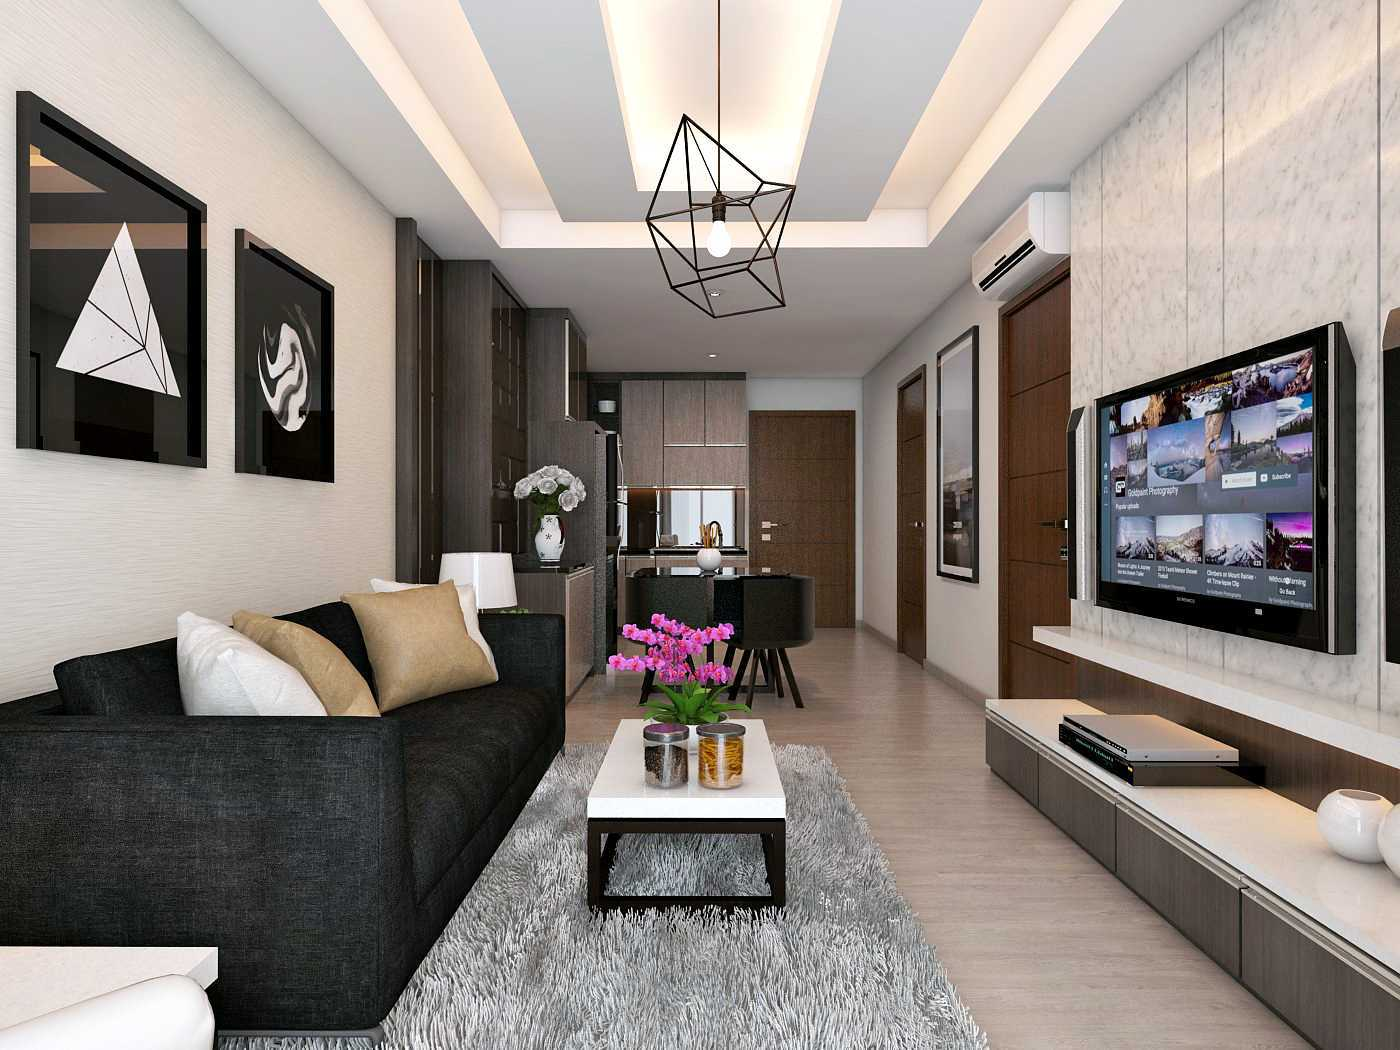 Habibullah Alfatih Condominium - Greenbay Pluit Jakarta, Indonesia Jakarta, Indonesia R-Keluarga-2 Kontemporer 35913